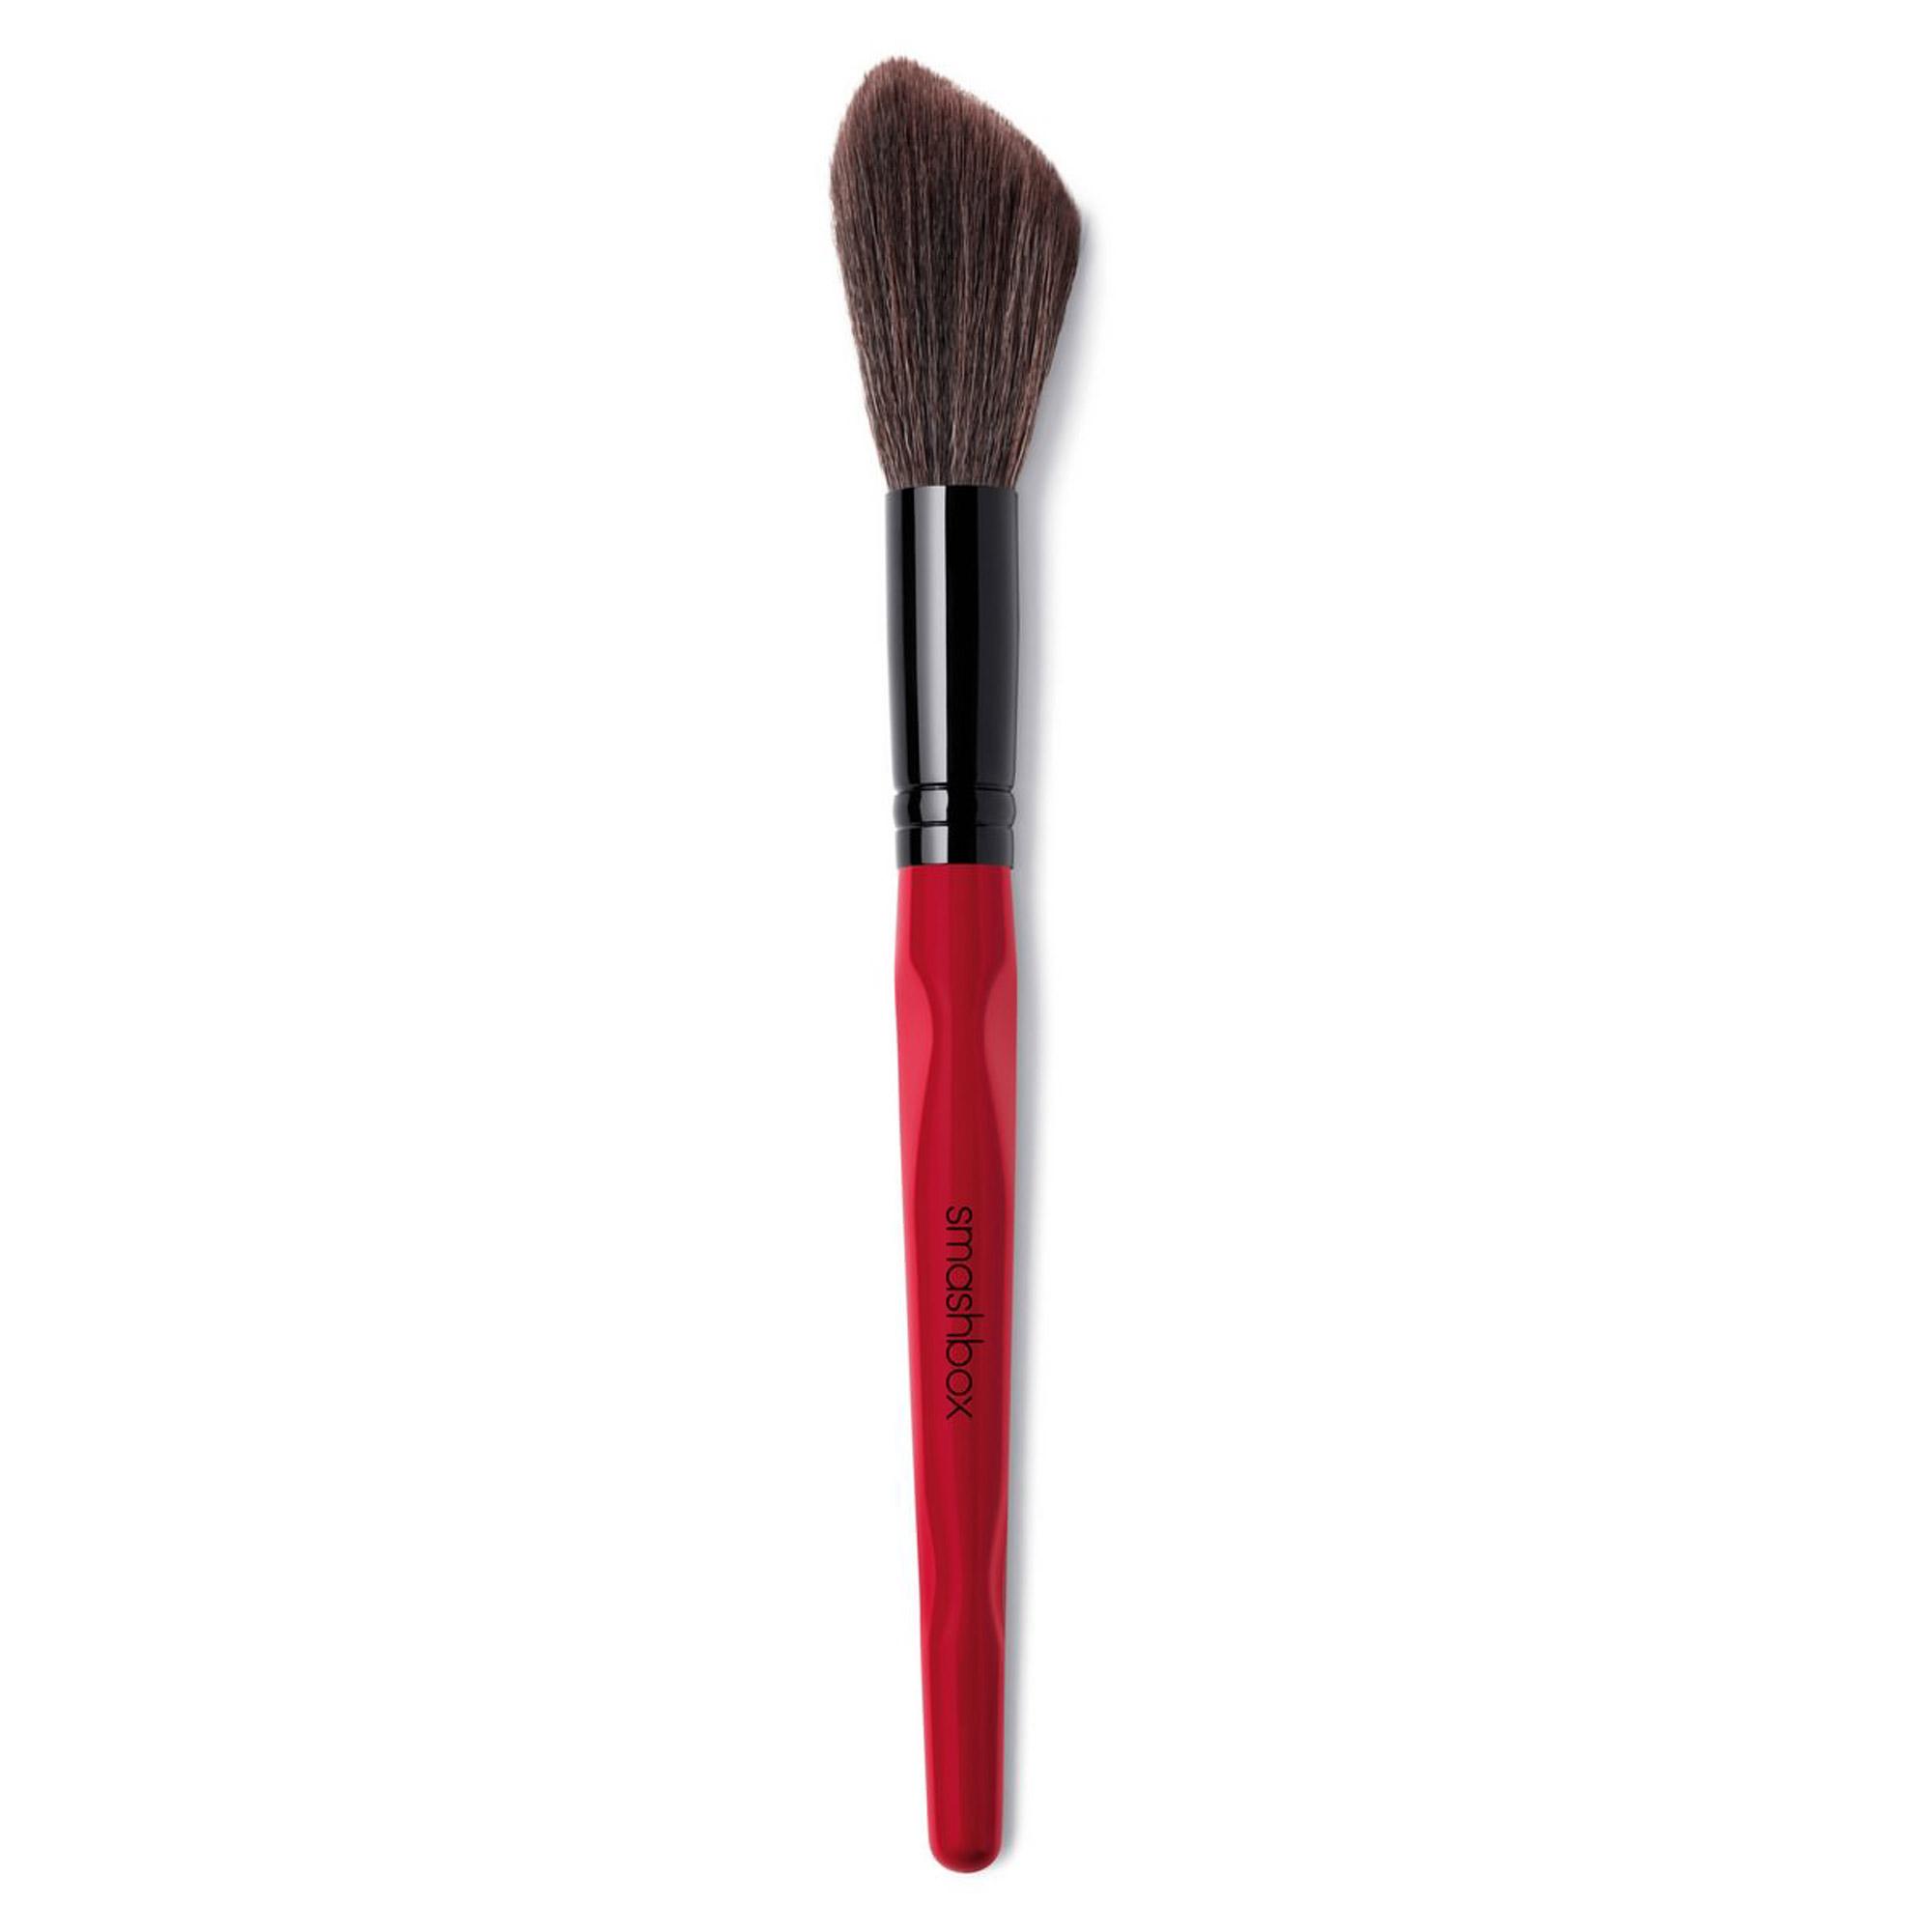 Sheer Powder Brush